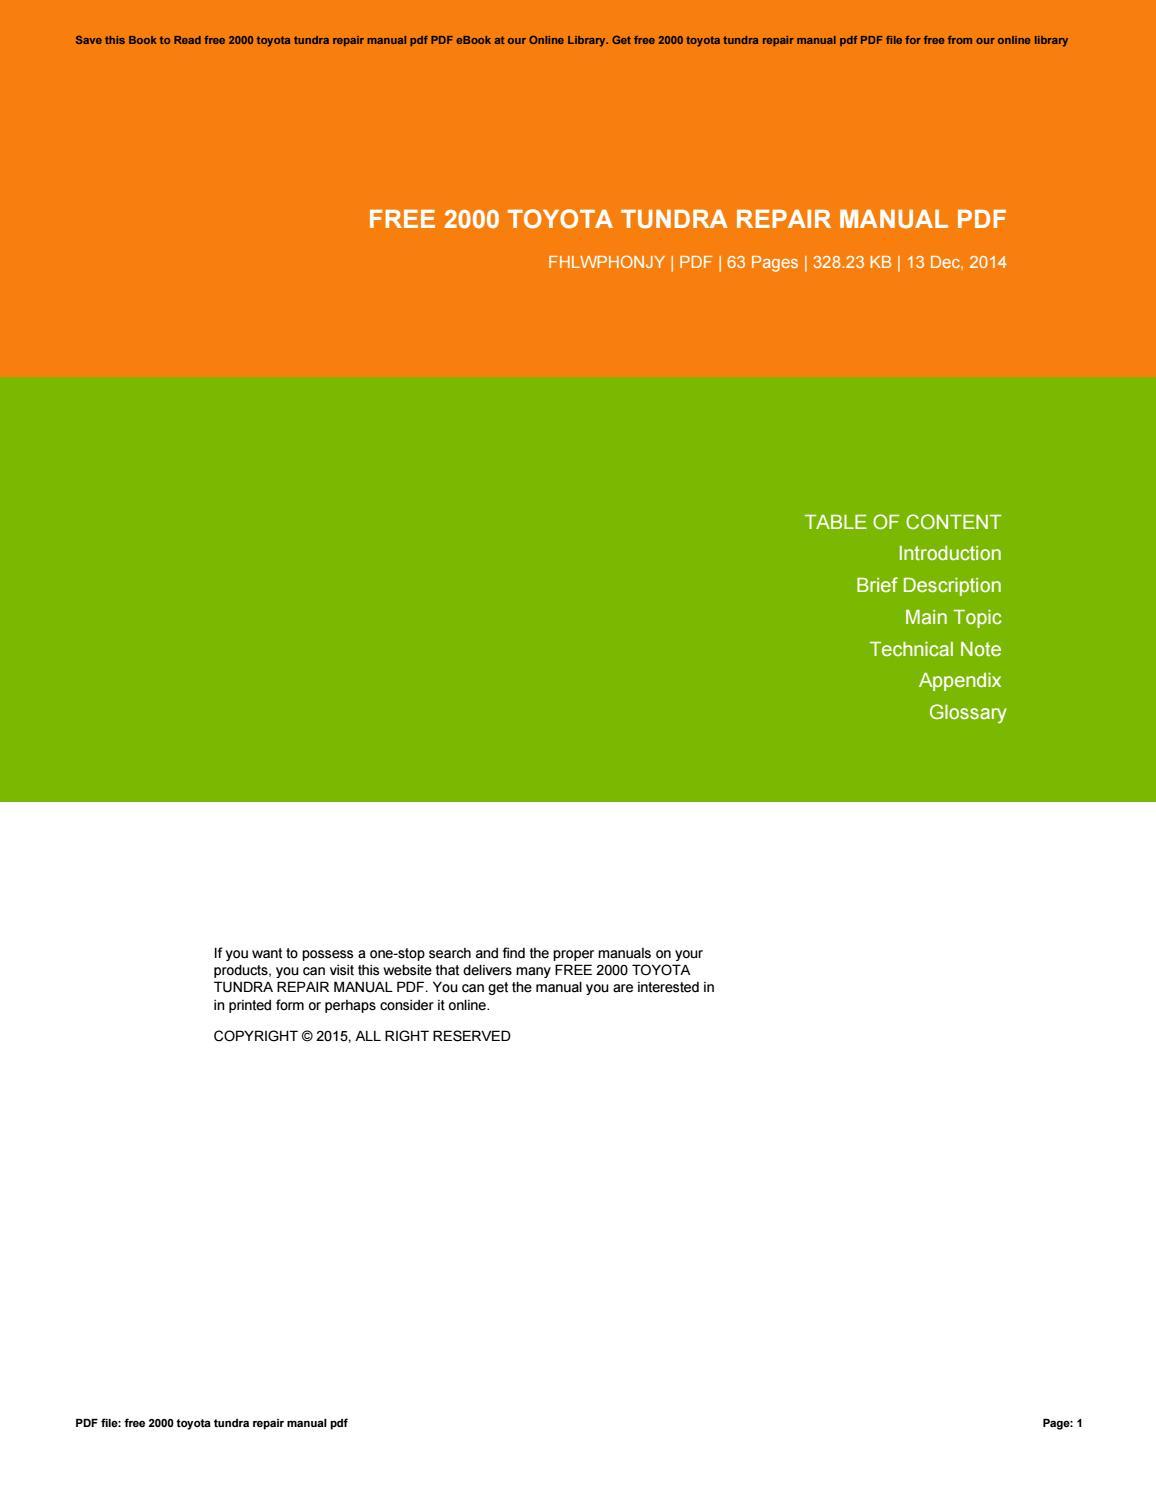 Volvo Penta Tad 1032 Ge Guide Ebook Mitsubishi F5m41 Gearbox Manual Transmission Components Parts Diagram Array Nikkor Repair Manuals Torrent Rh Vwhost Org